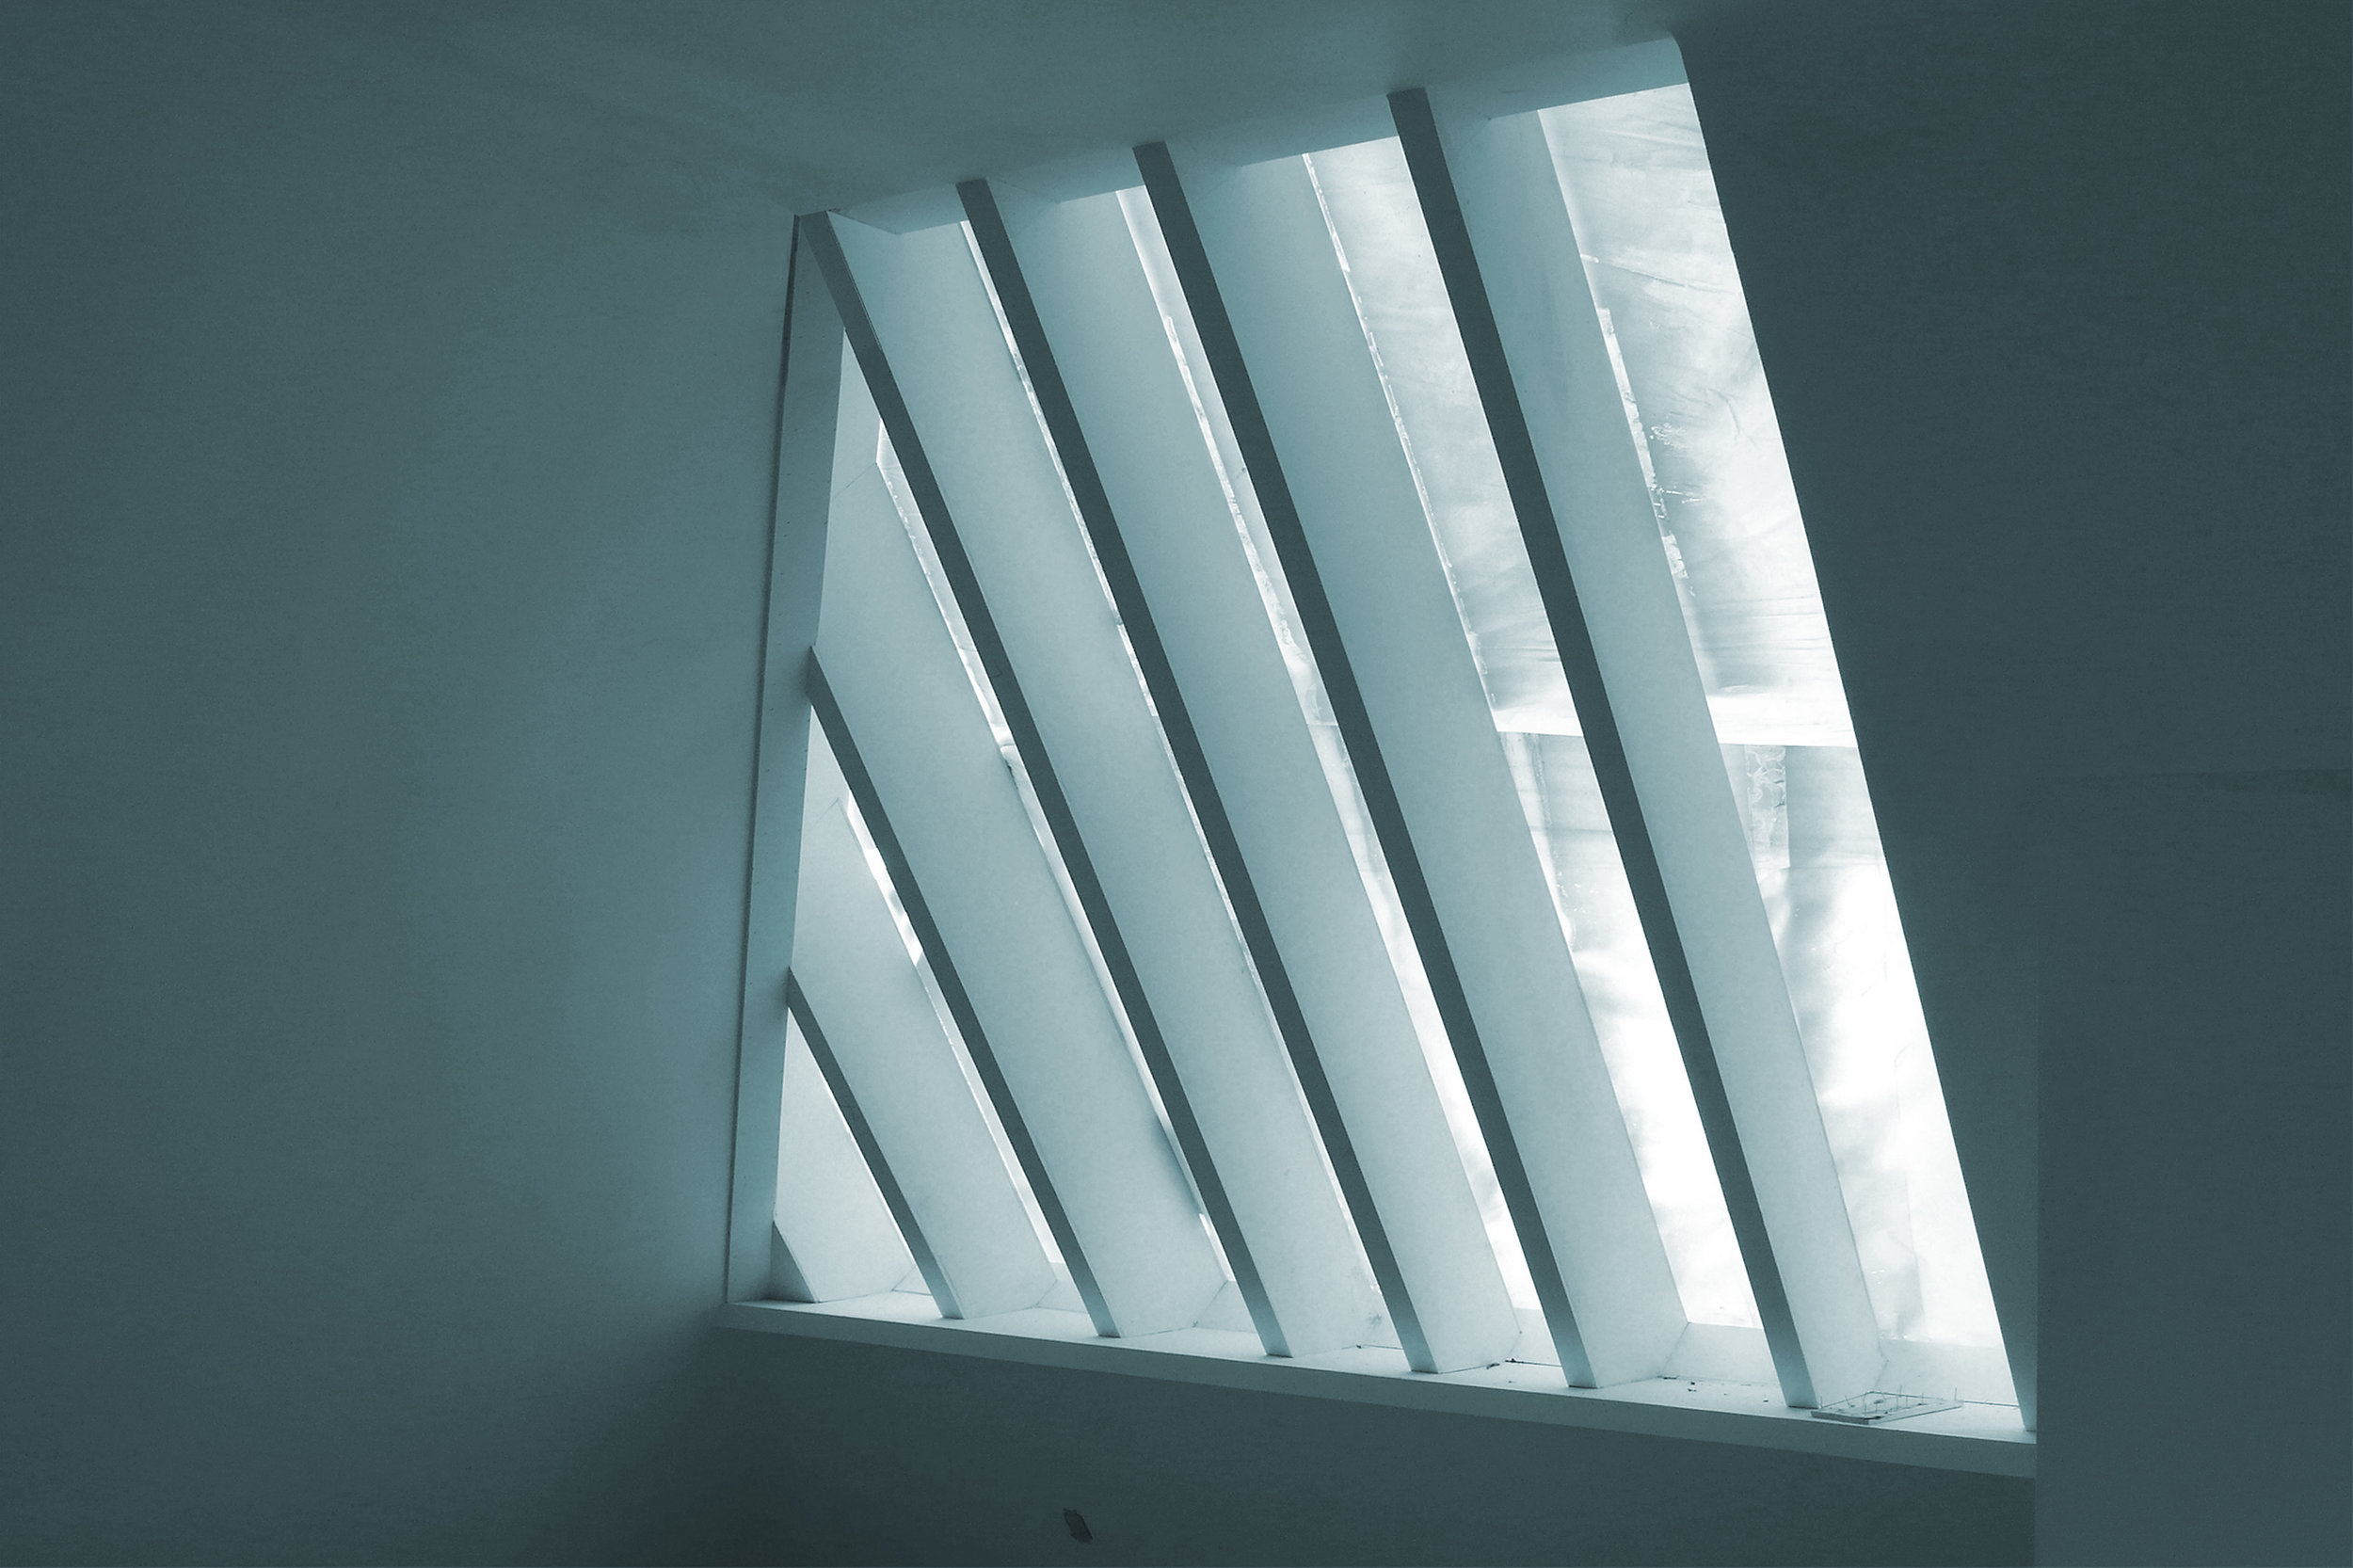 Pine-Tree Window , 2012 silkscreen on glass 43-1/4 x 63-3/4 inches, 110 x 162 cm Edition of 5